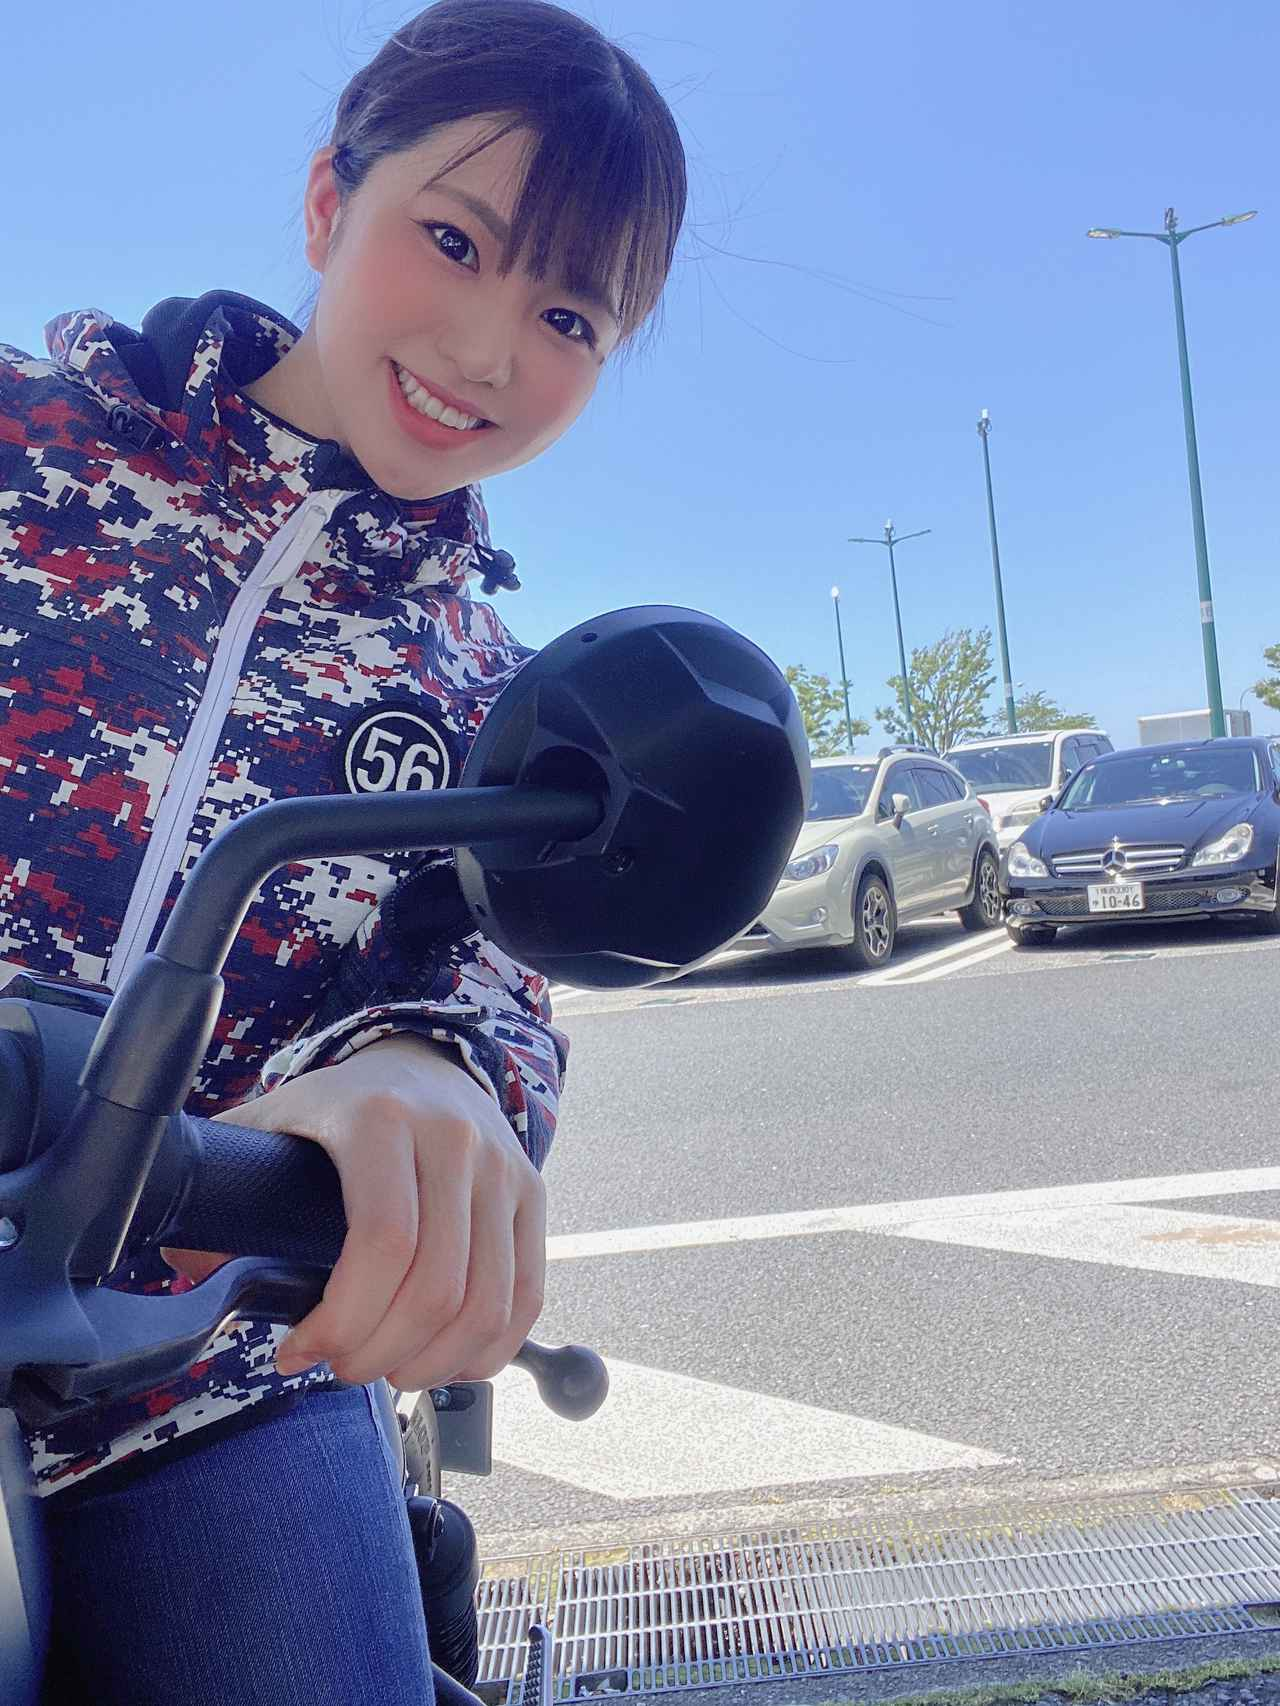 Images : 3番目の画像 - 「【動画あり】ほぼ月刊「梅本まどかとオートバイ」vol.25 HONDA Rebel250」のアルバム - webオートバイ